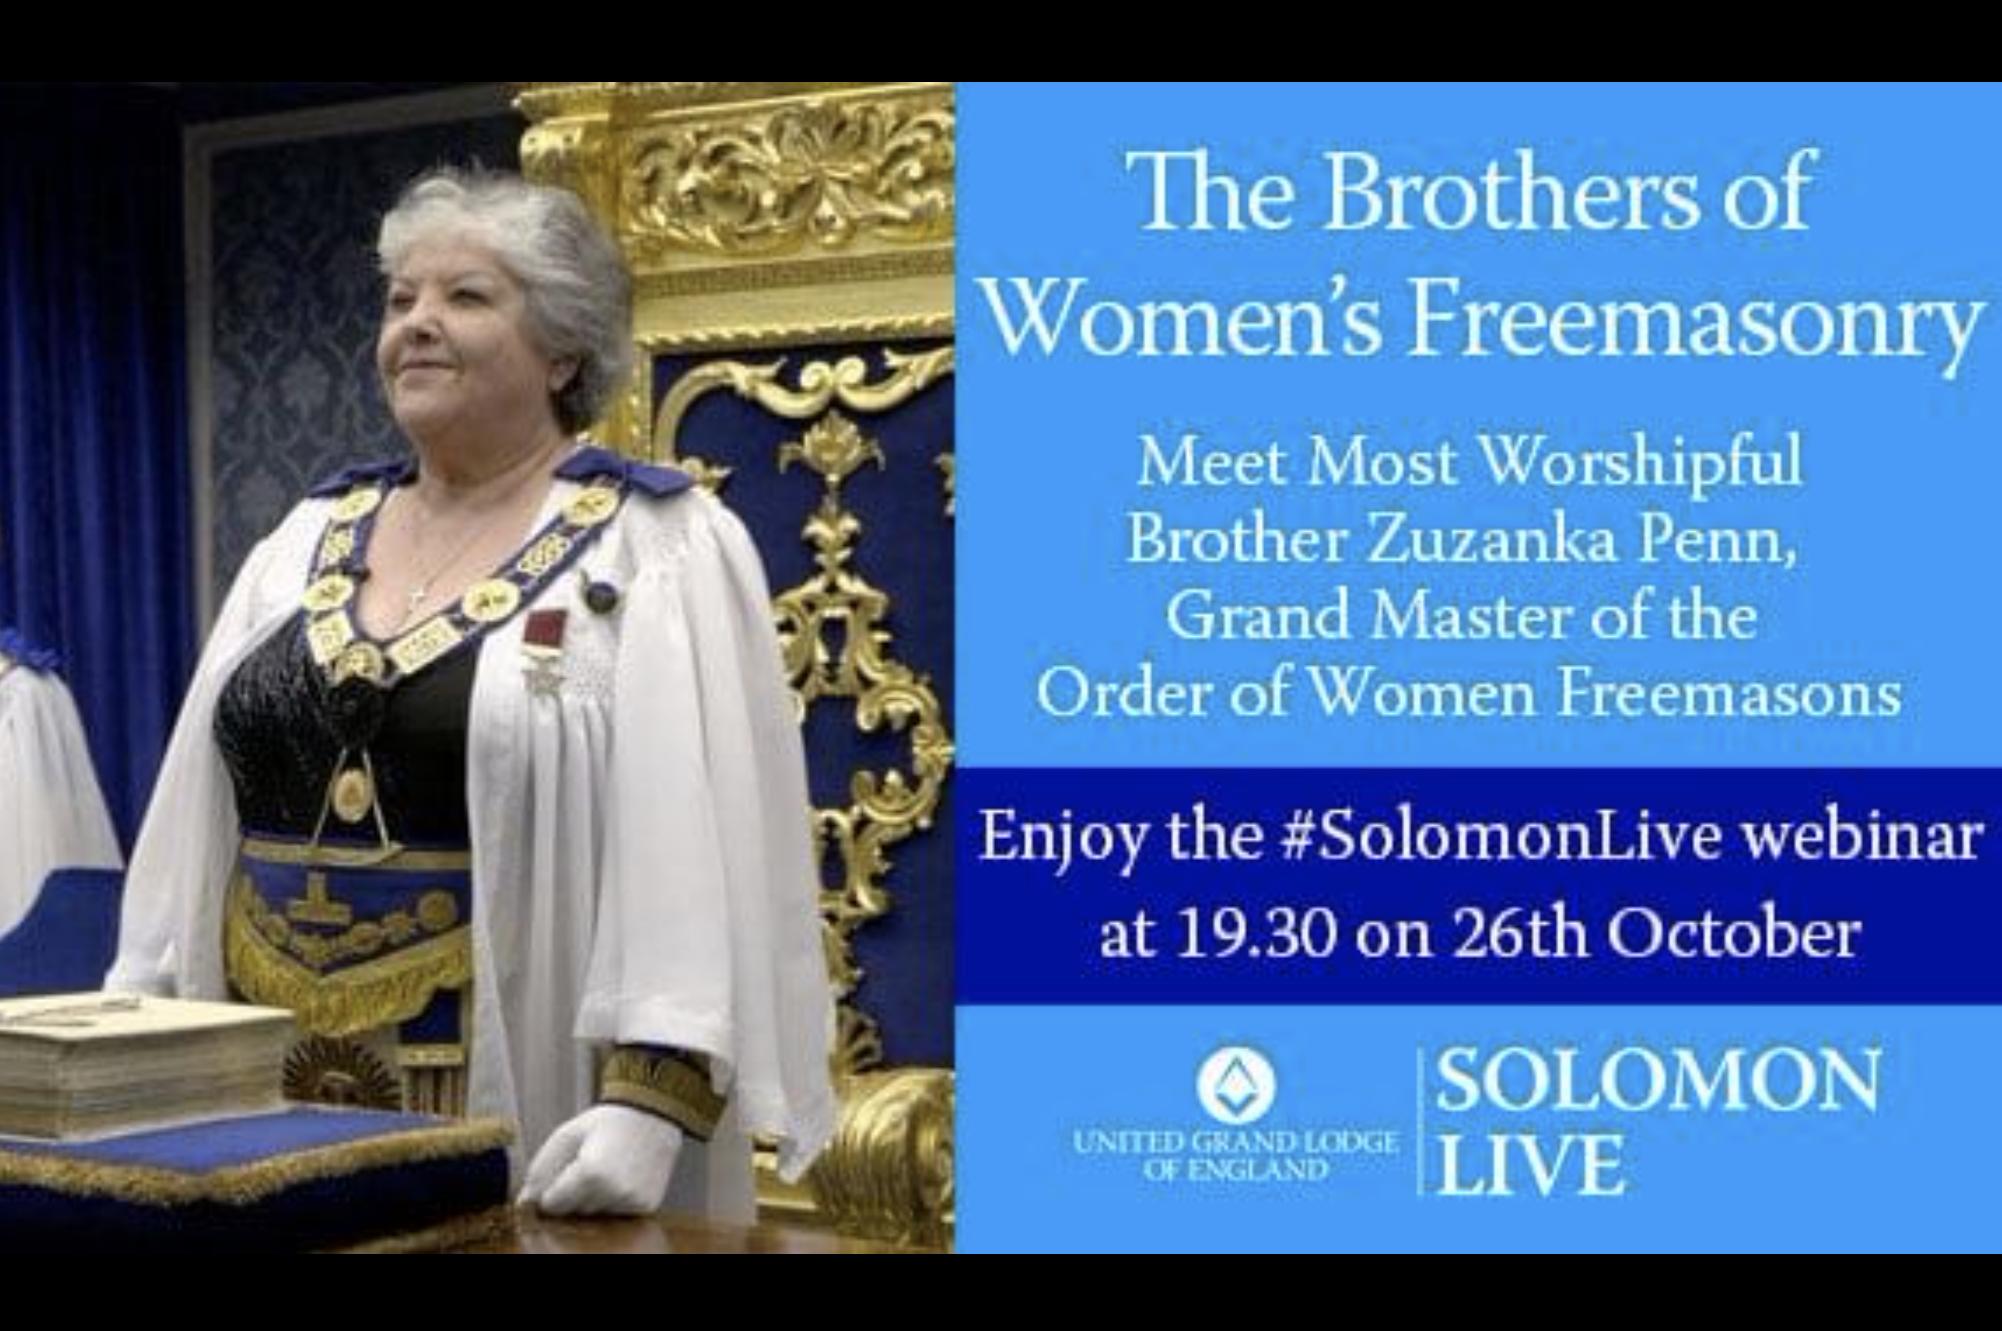 The Brothers of Women's Freemasonry